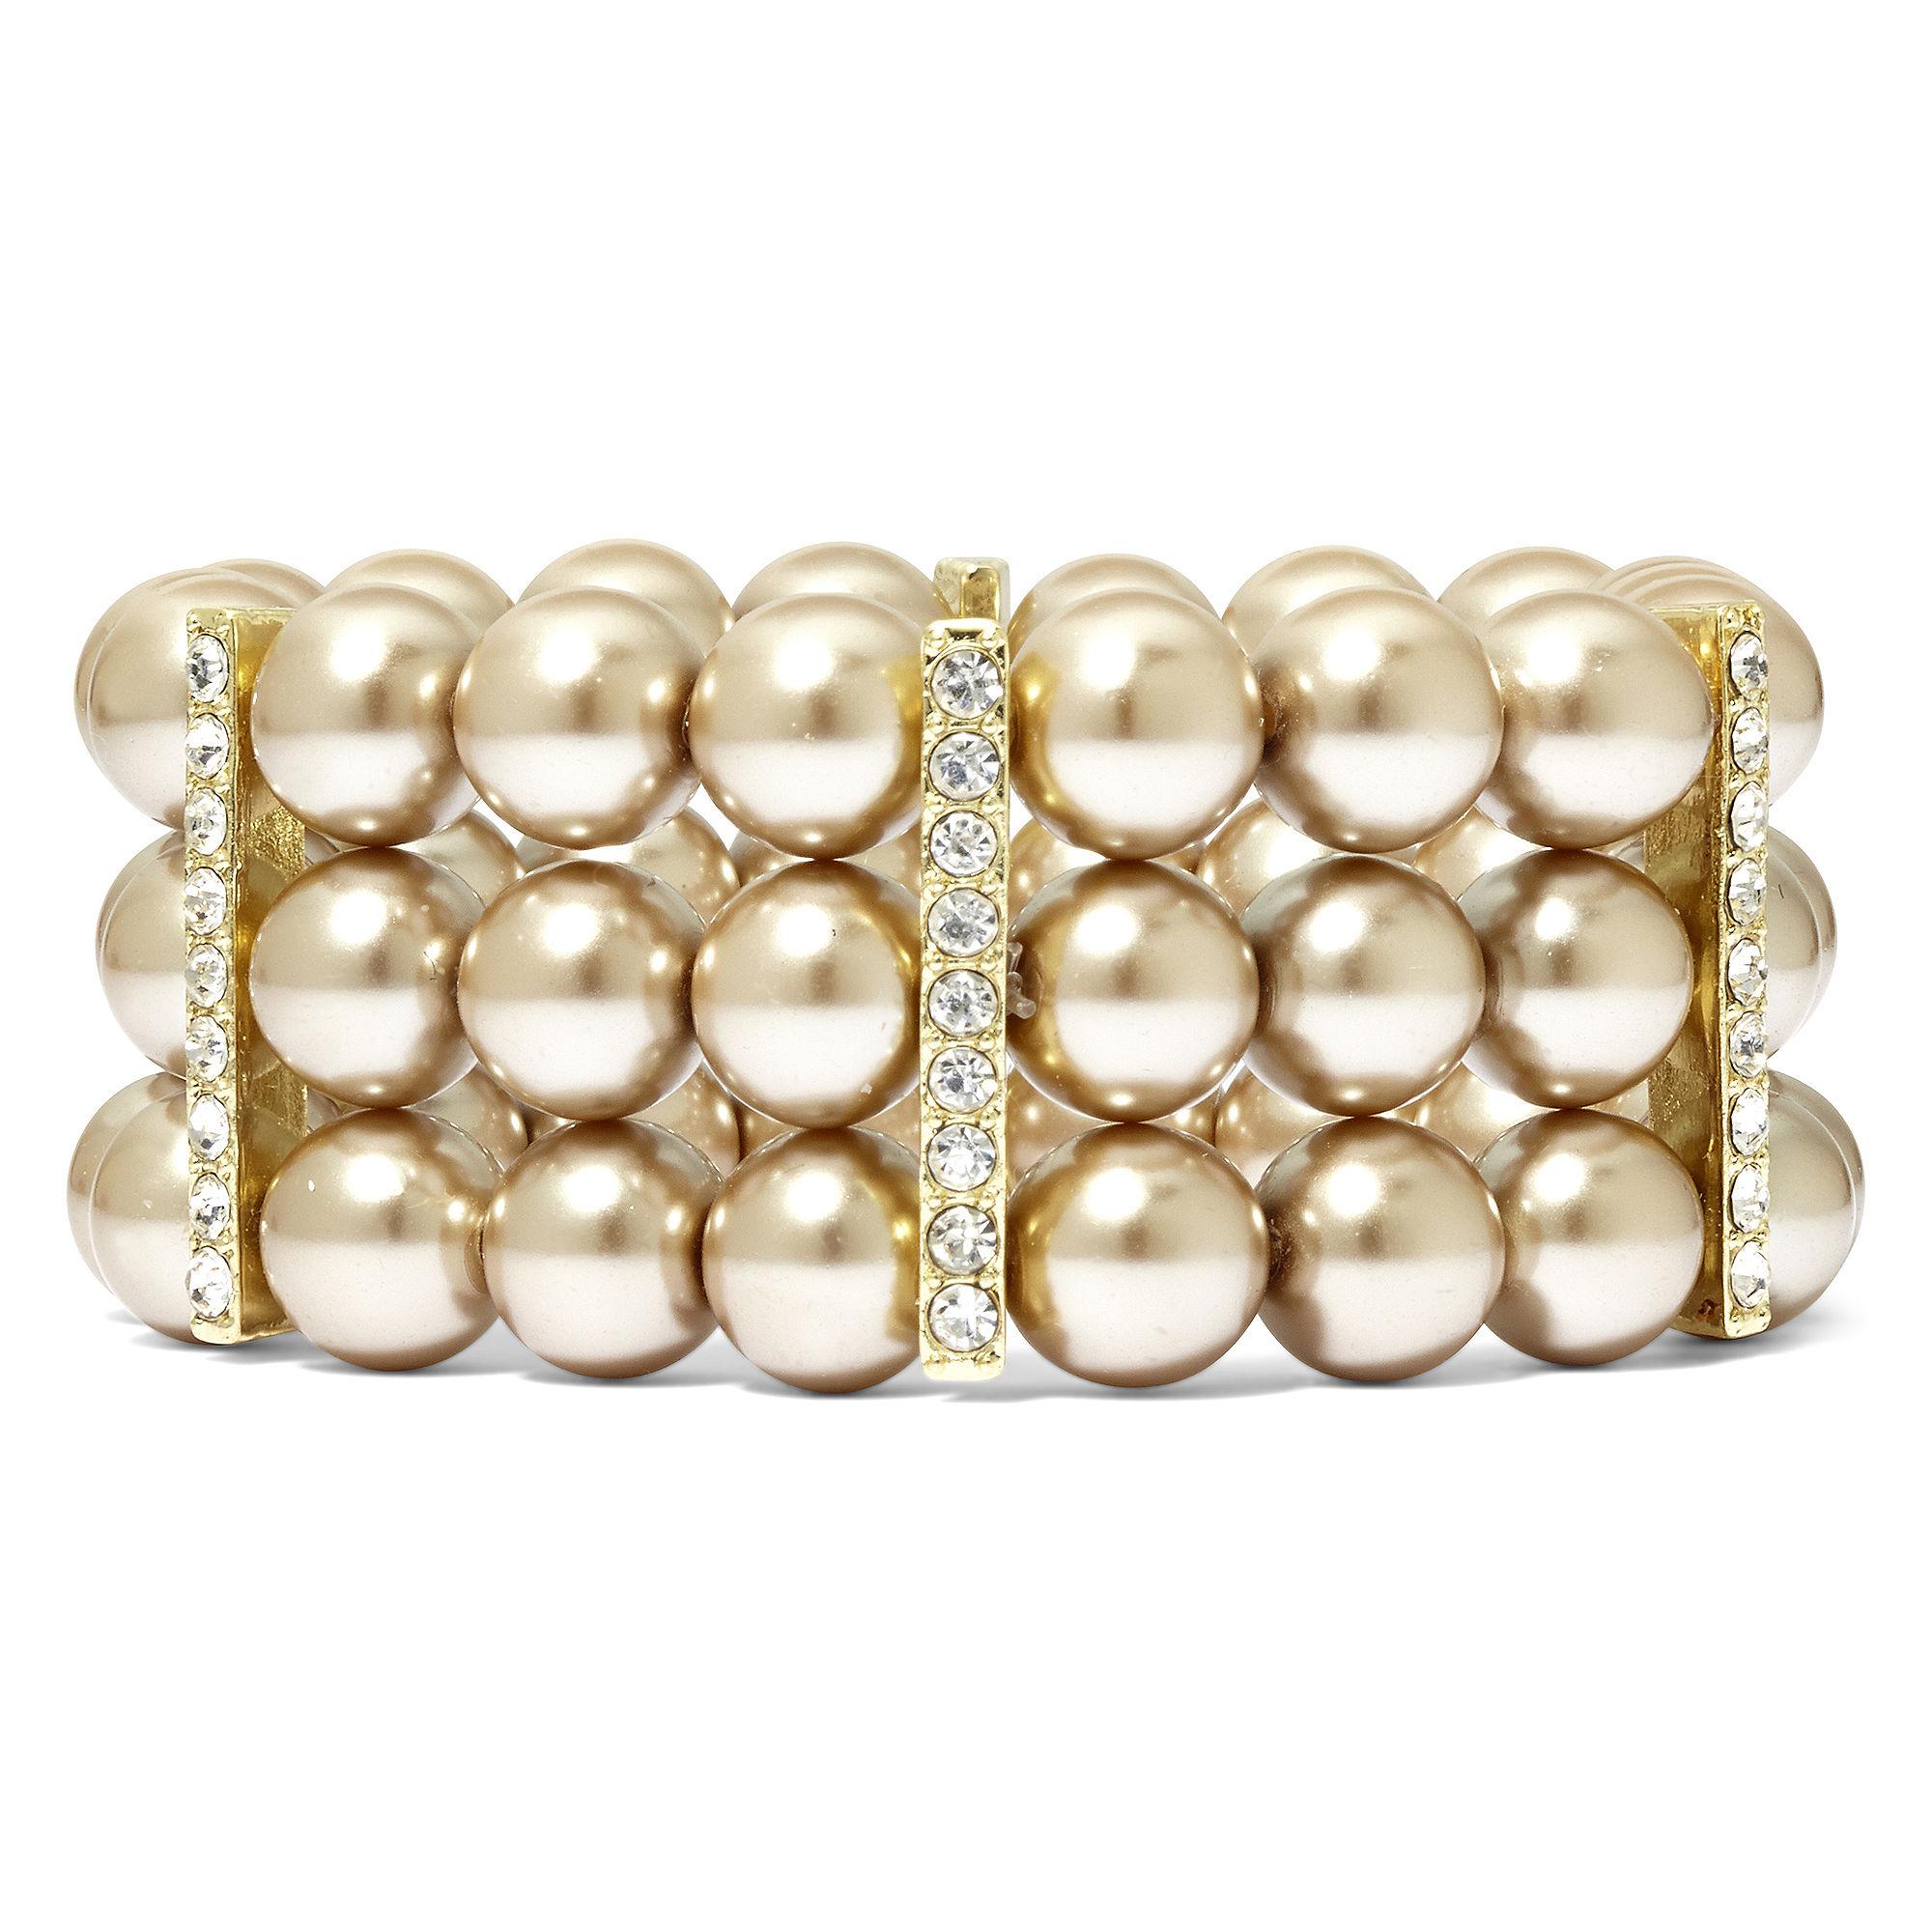 Vieste Silver-Tone Pearlized Glass Bead 3-Row Stretch Bracelet